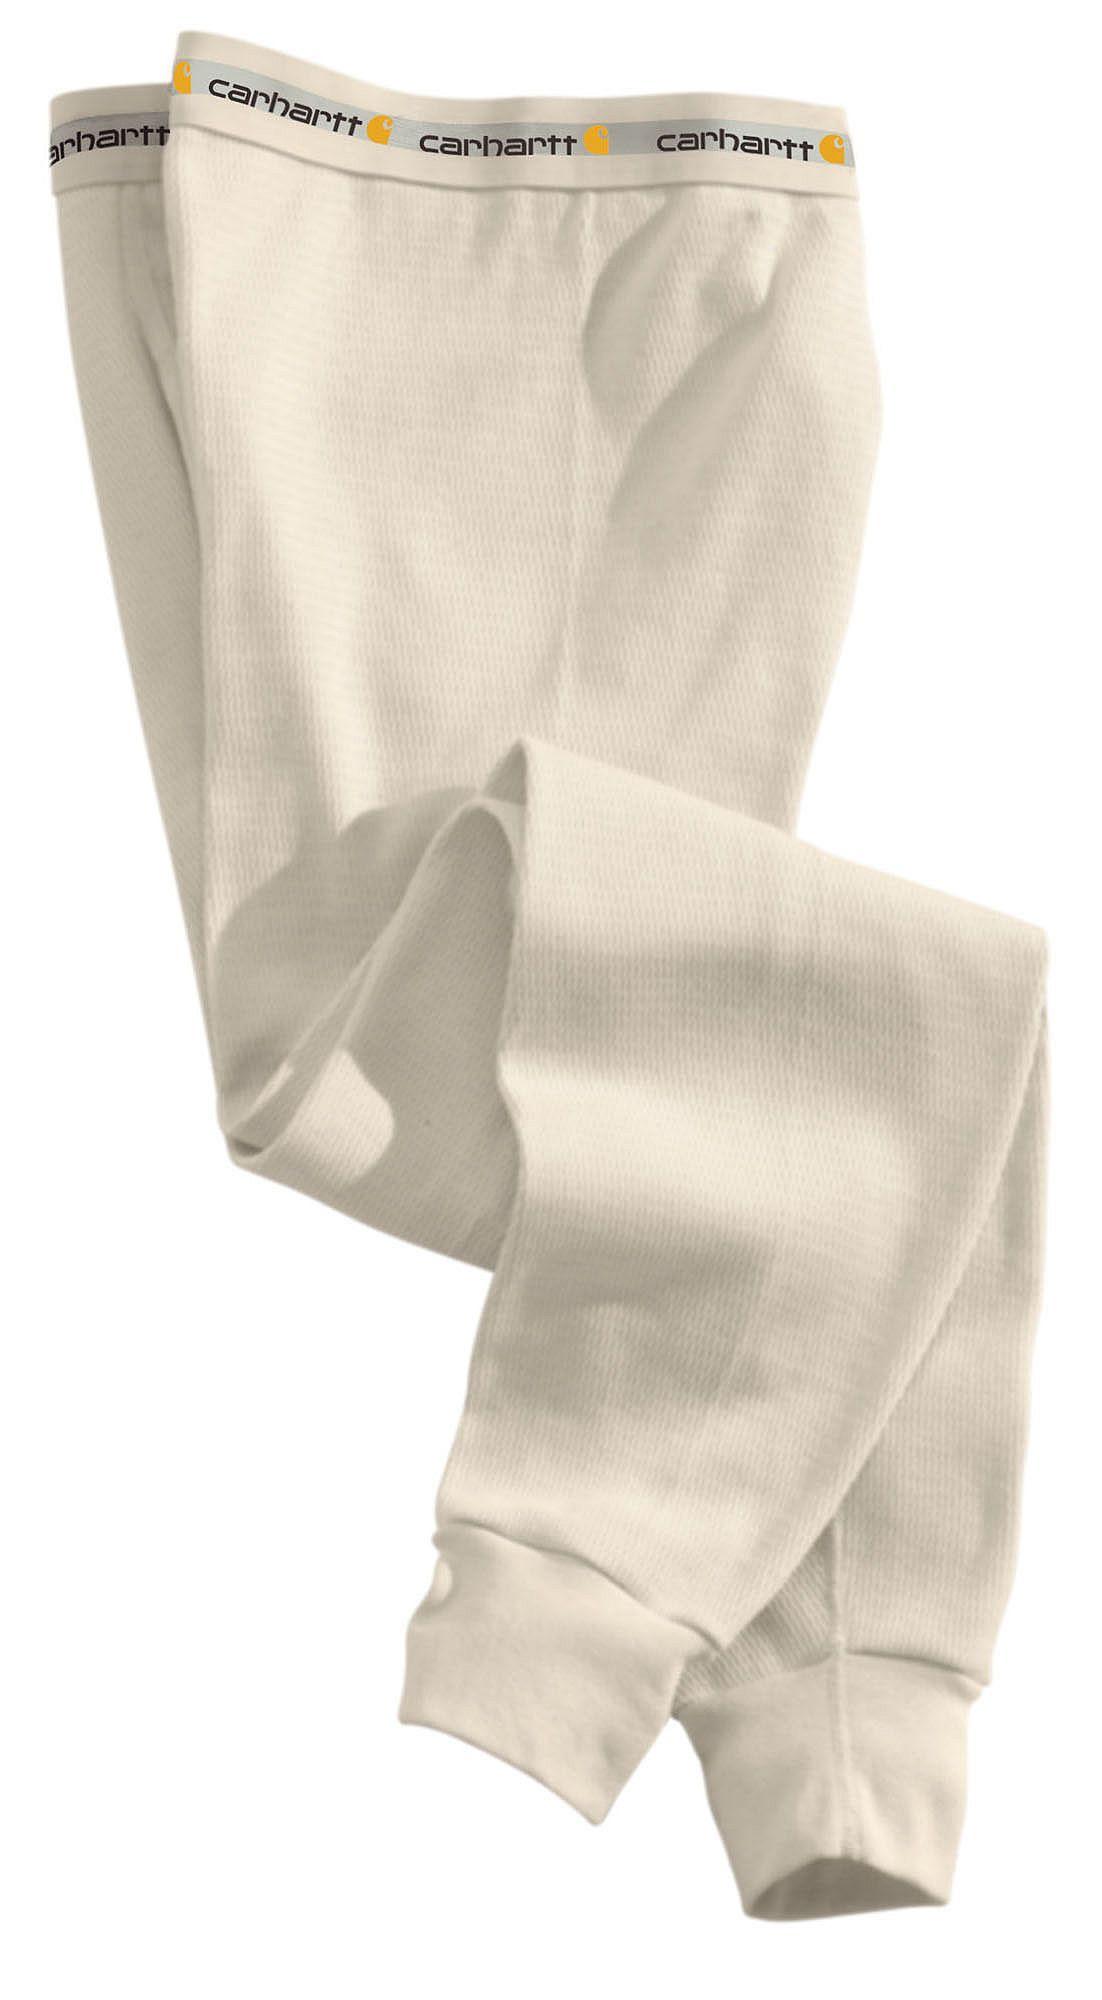 Carhartt Heavy Weight Cotton Thermal Underwear - Big & Tall | Sheplers